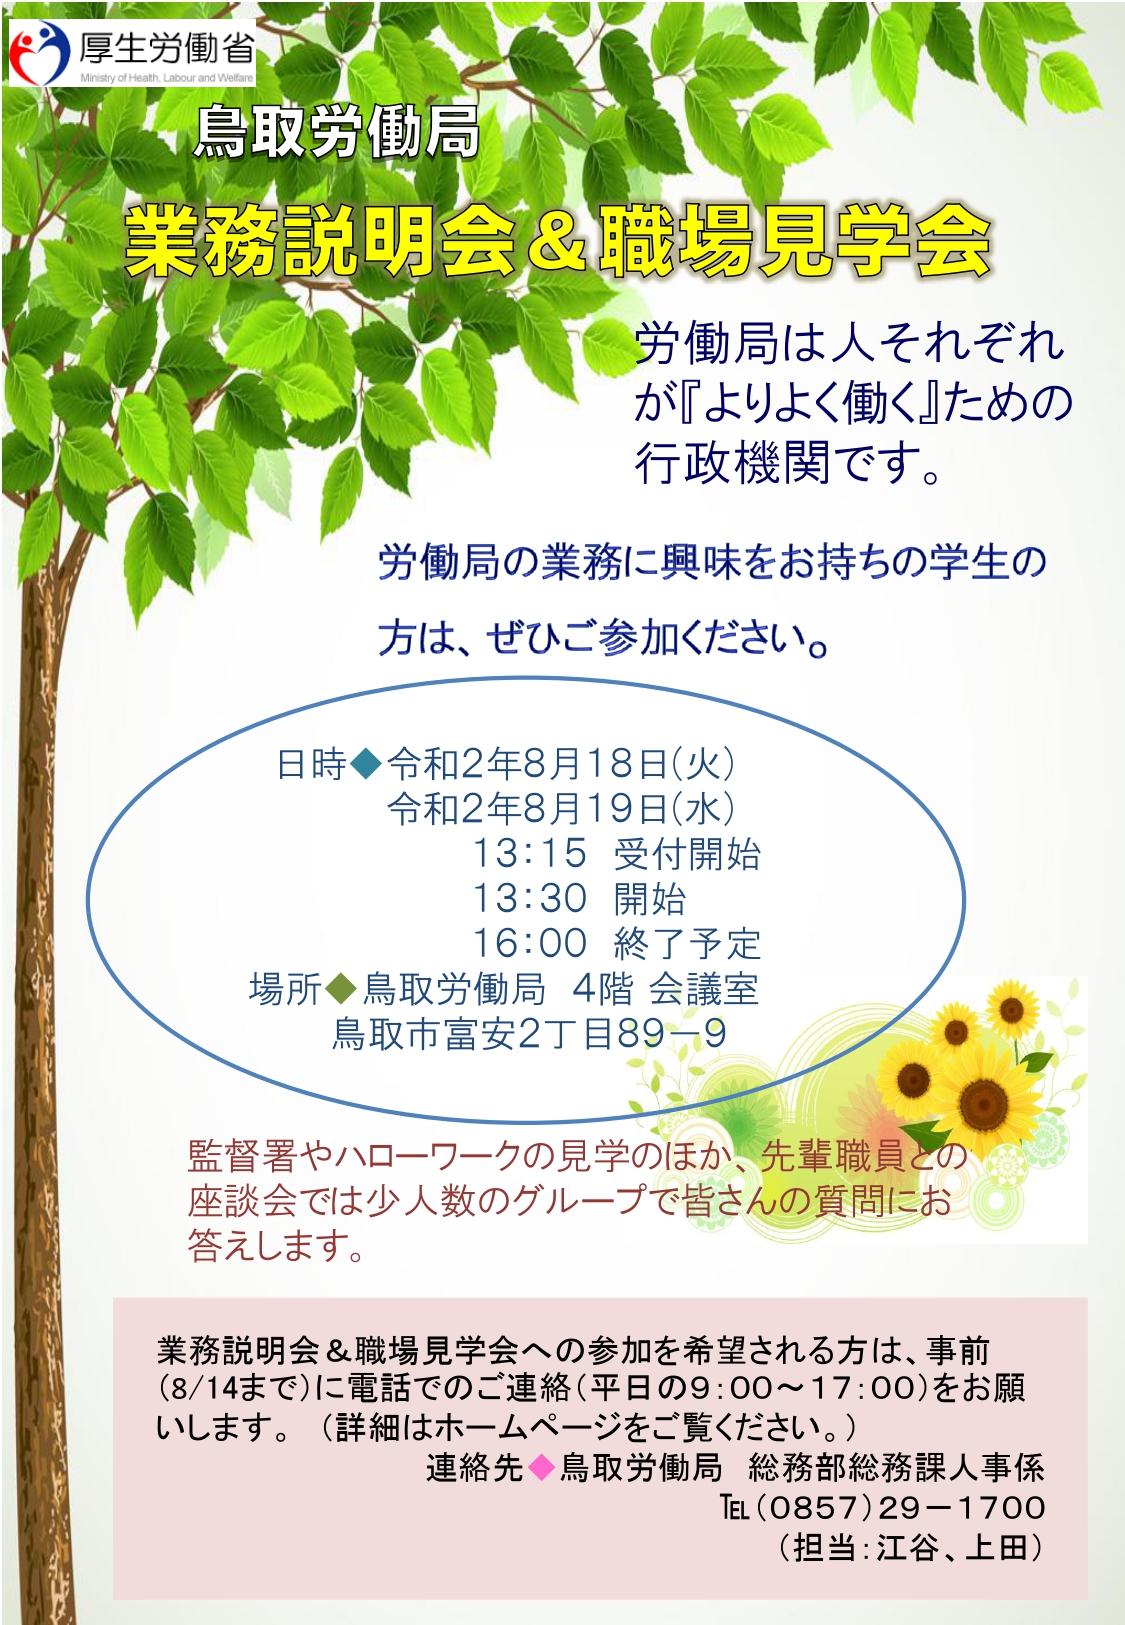 Tottori page 0001